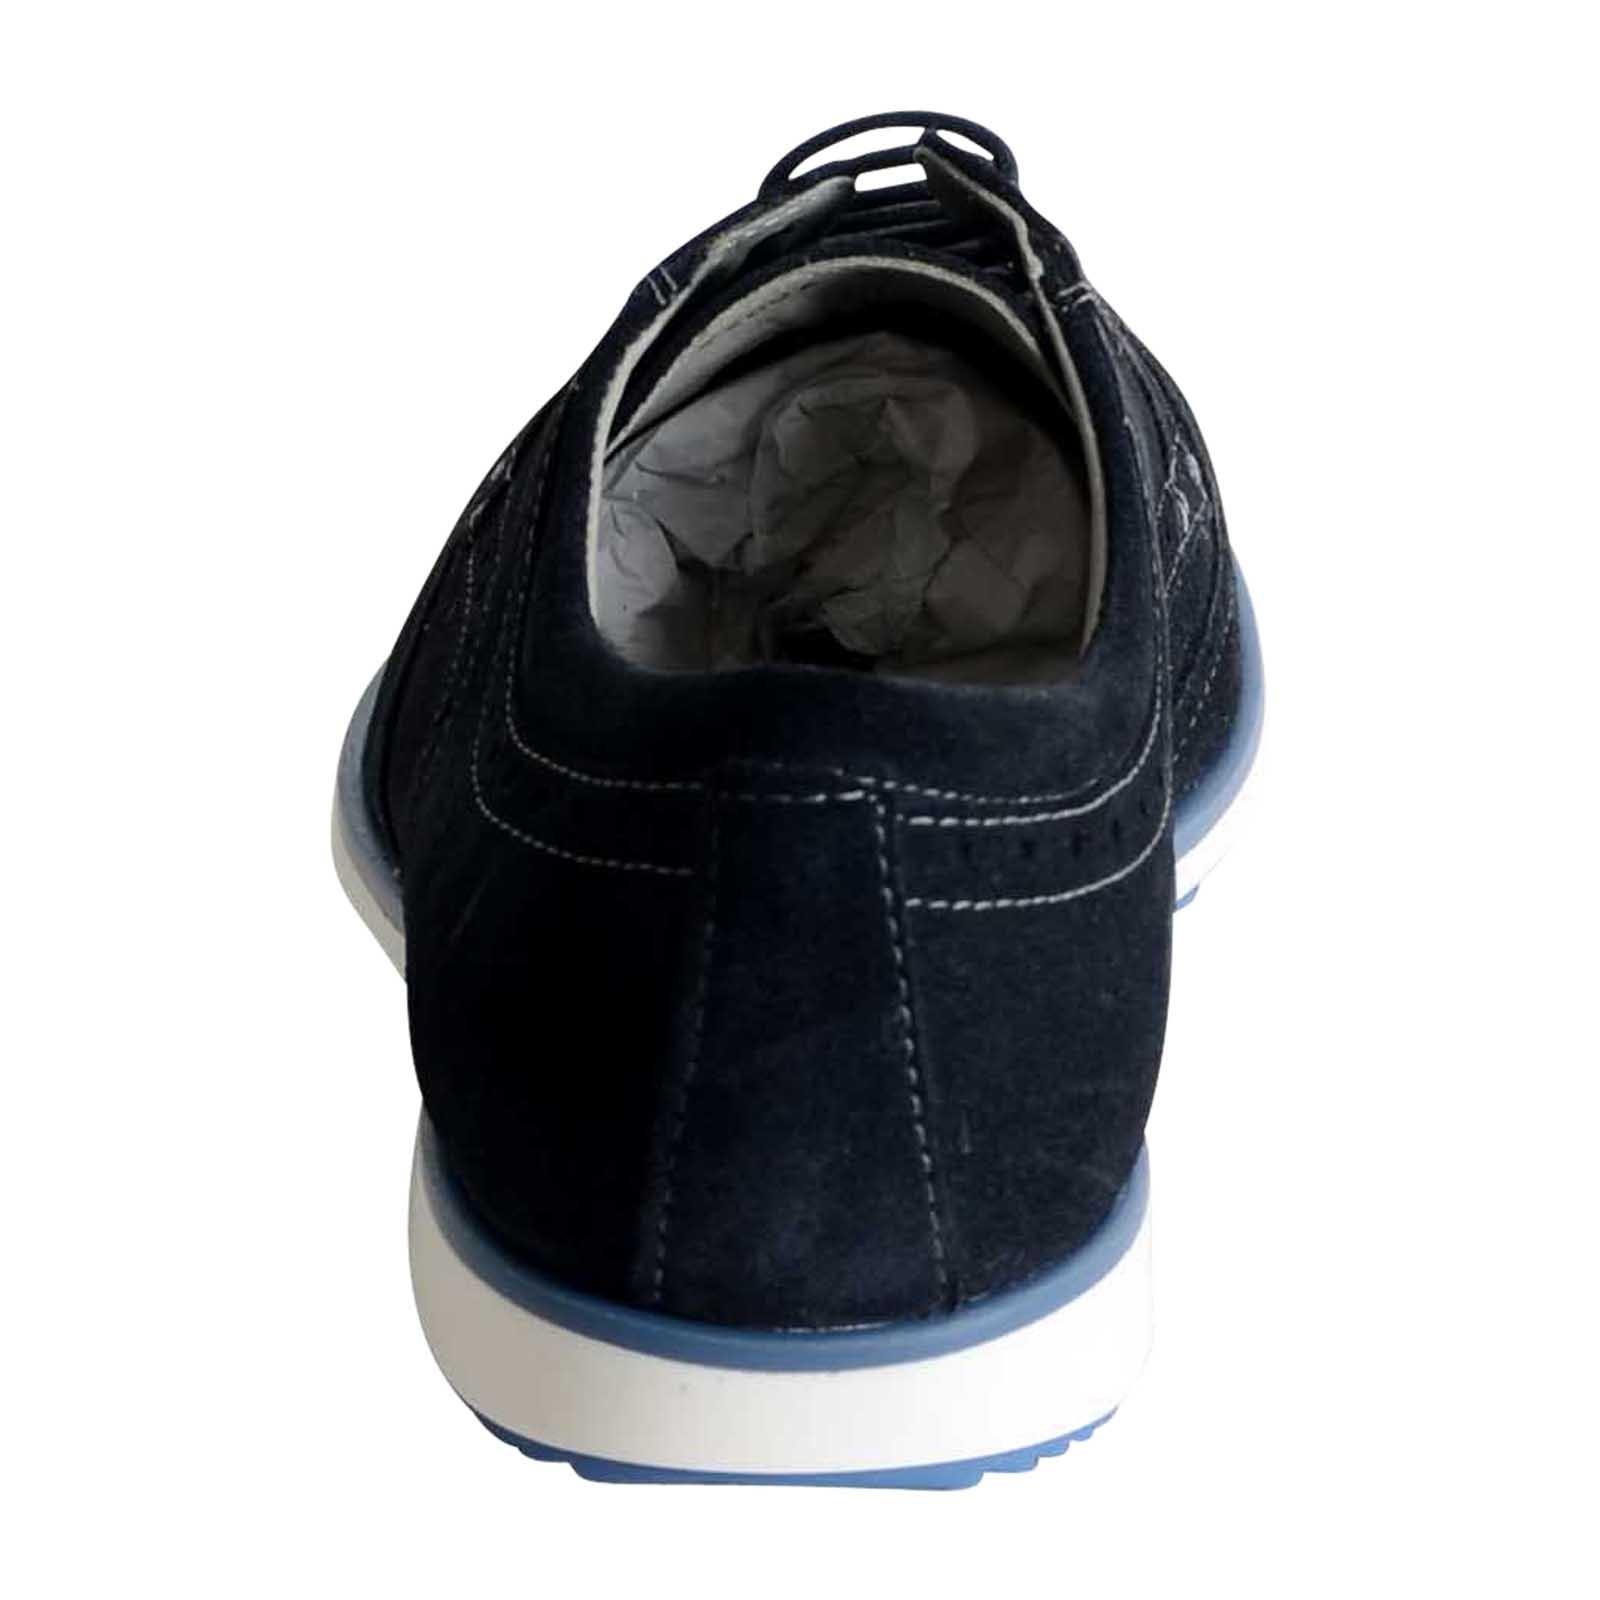 Chaussure-Geox-U-BLAINEY-A-SUEDE miniature 5